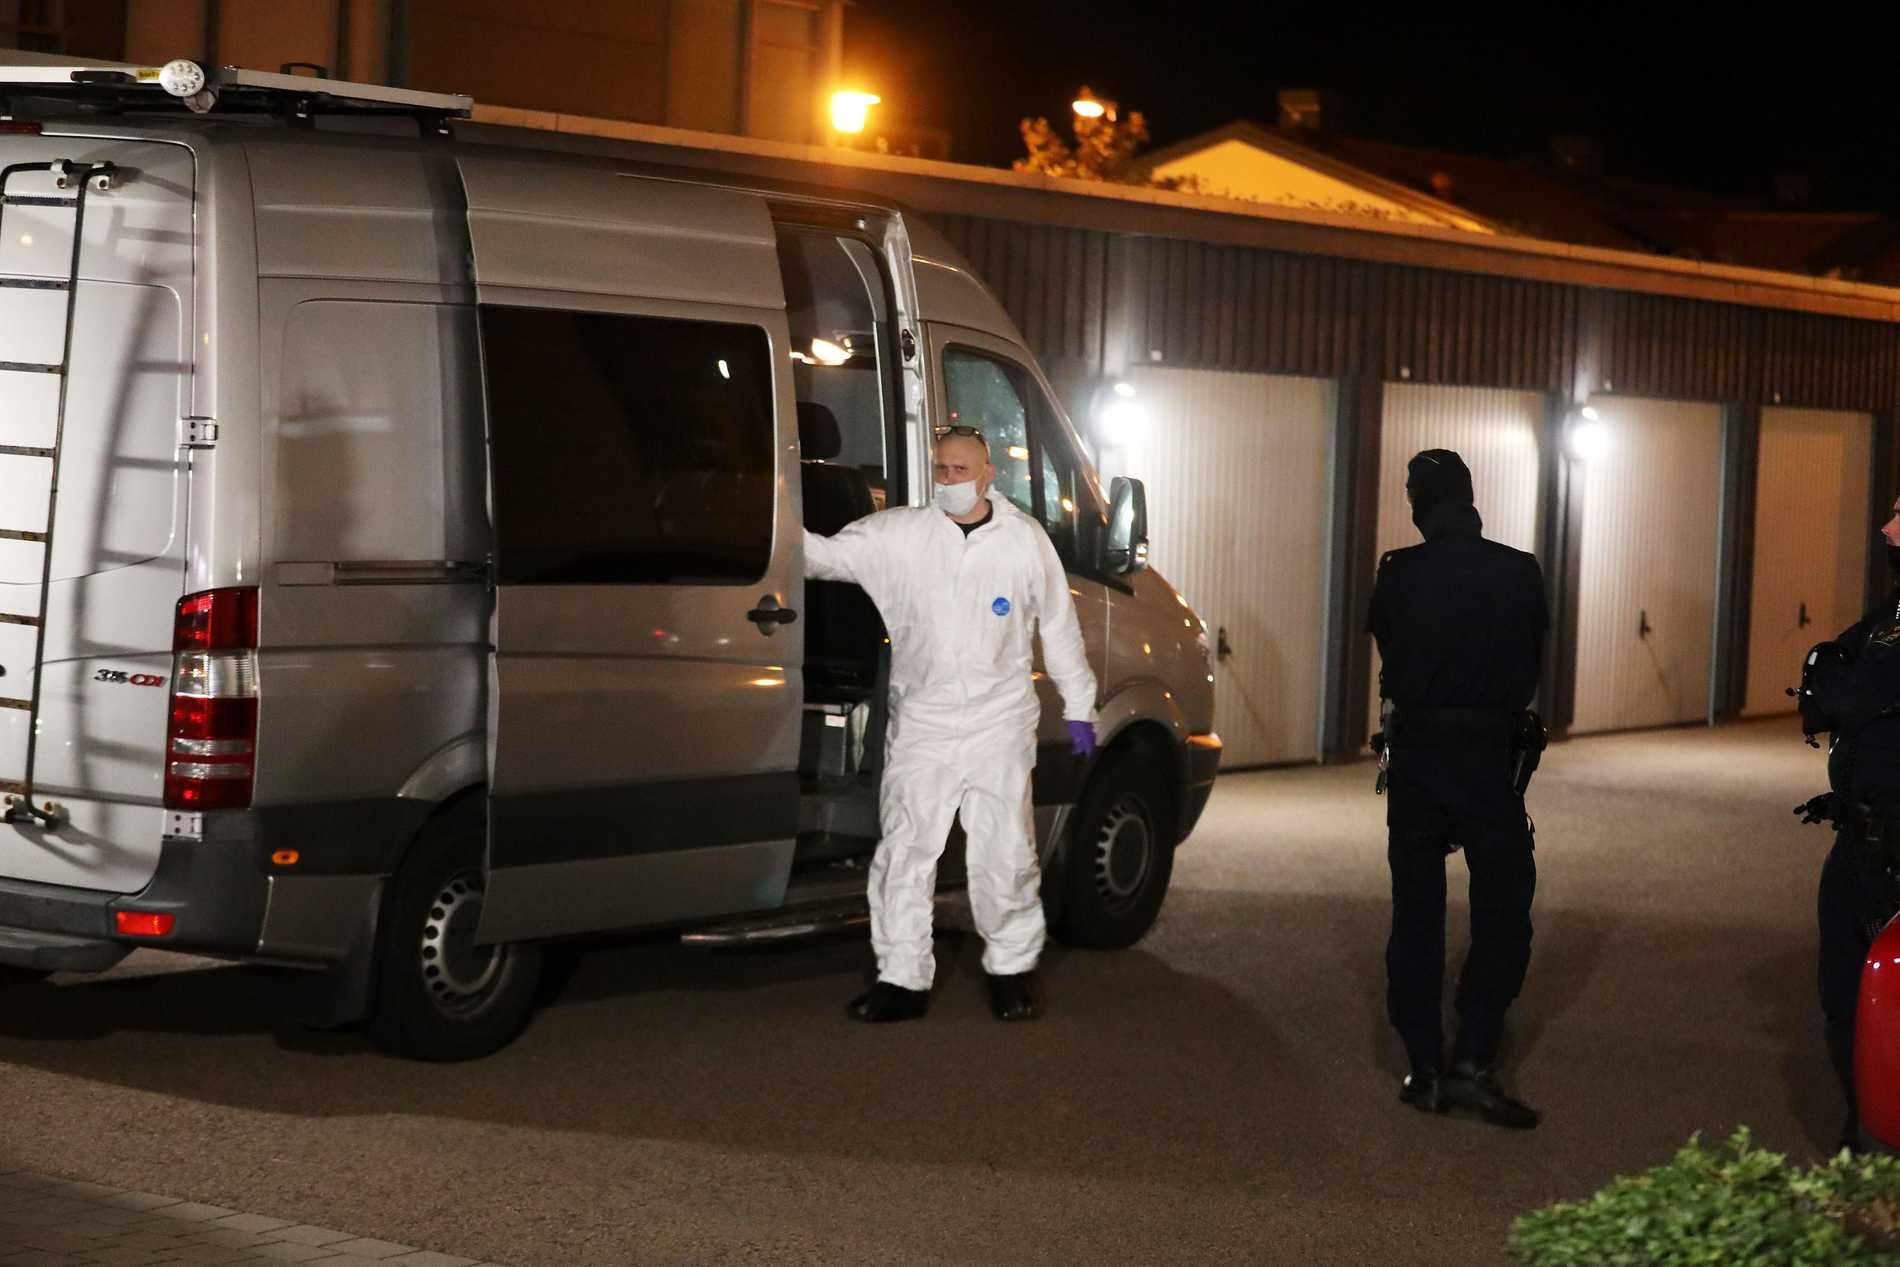 Dubbelmordet i Arlv: Polisen sker mjligt vittne | Aftonbladet